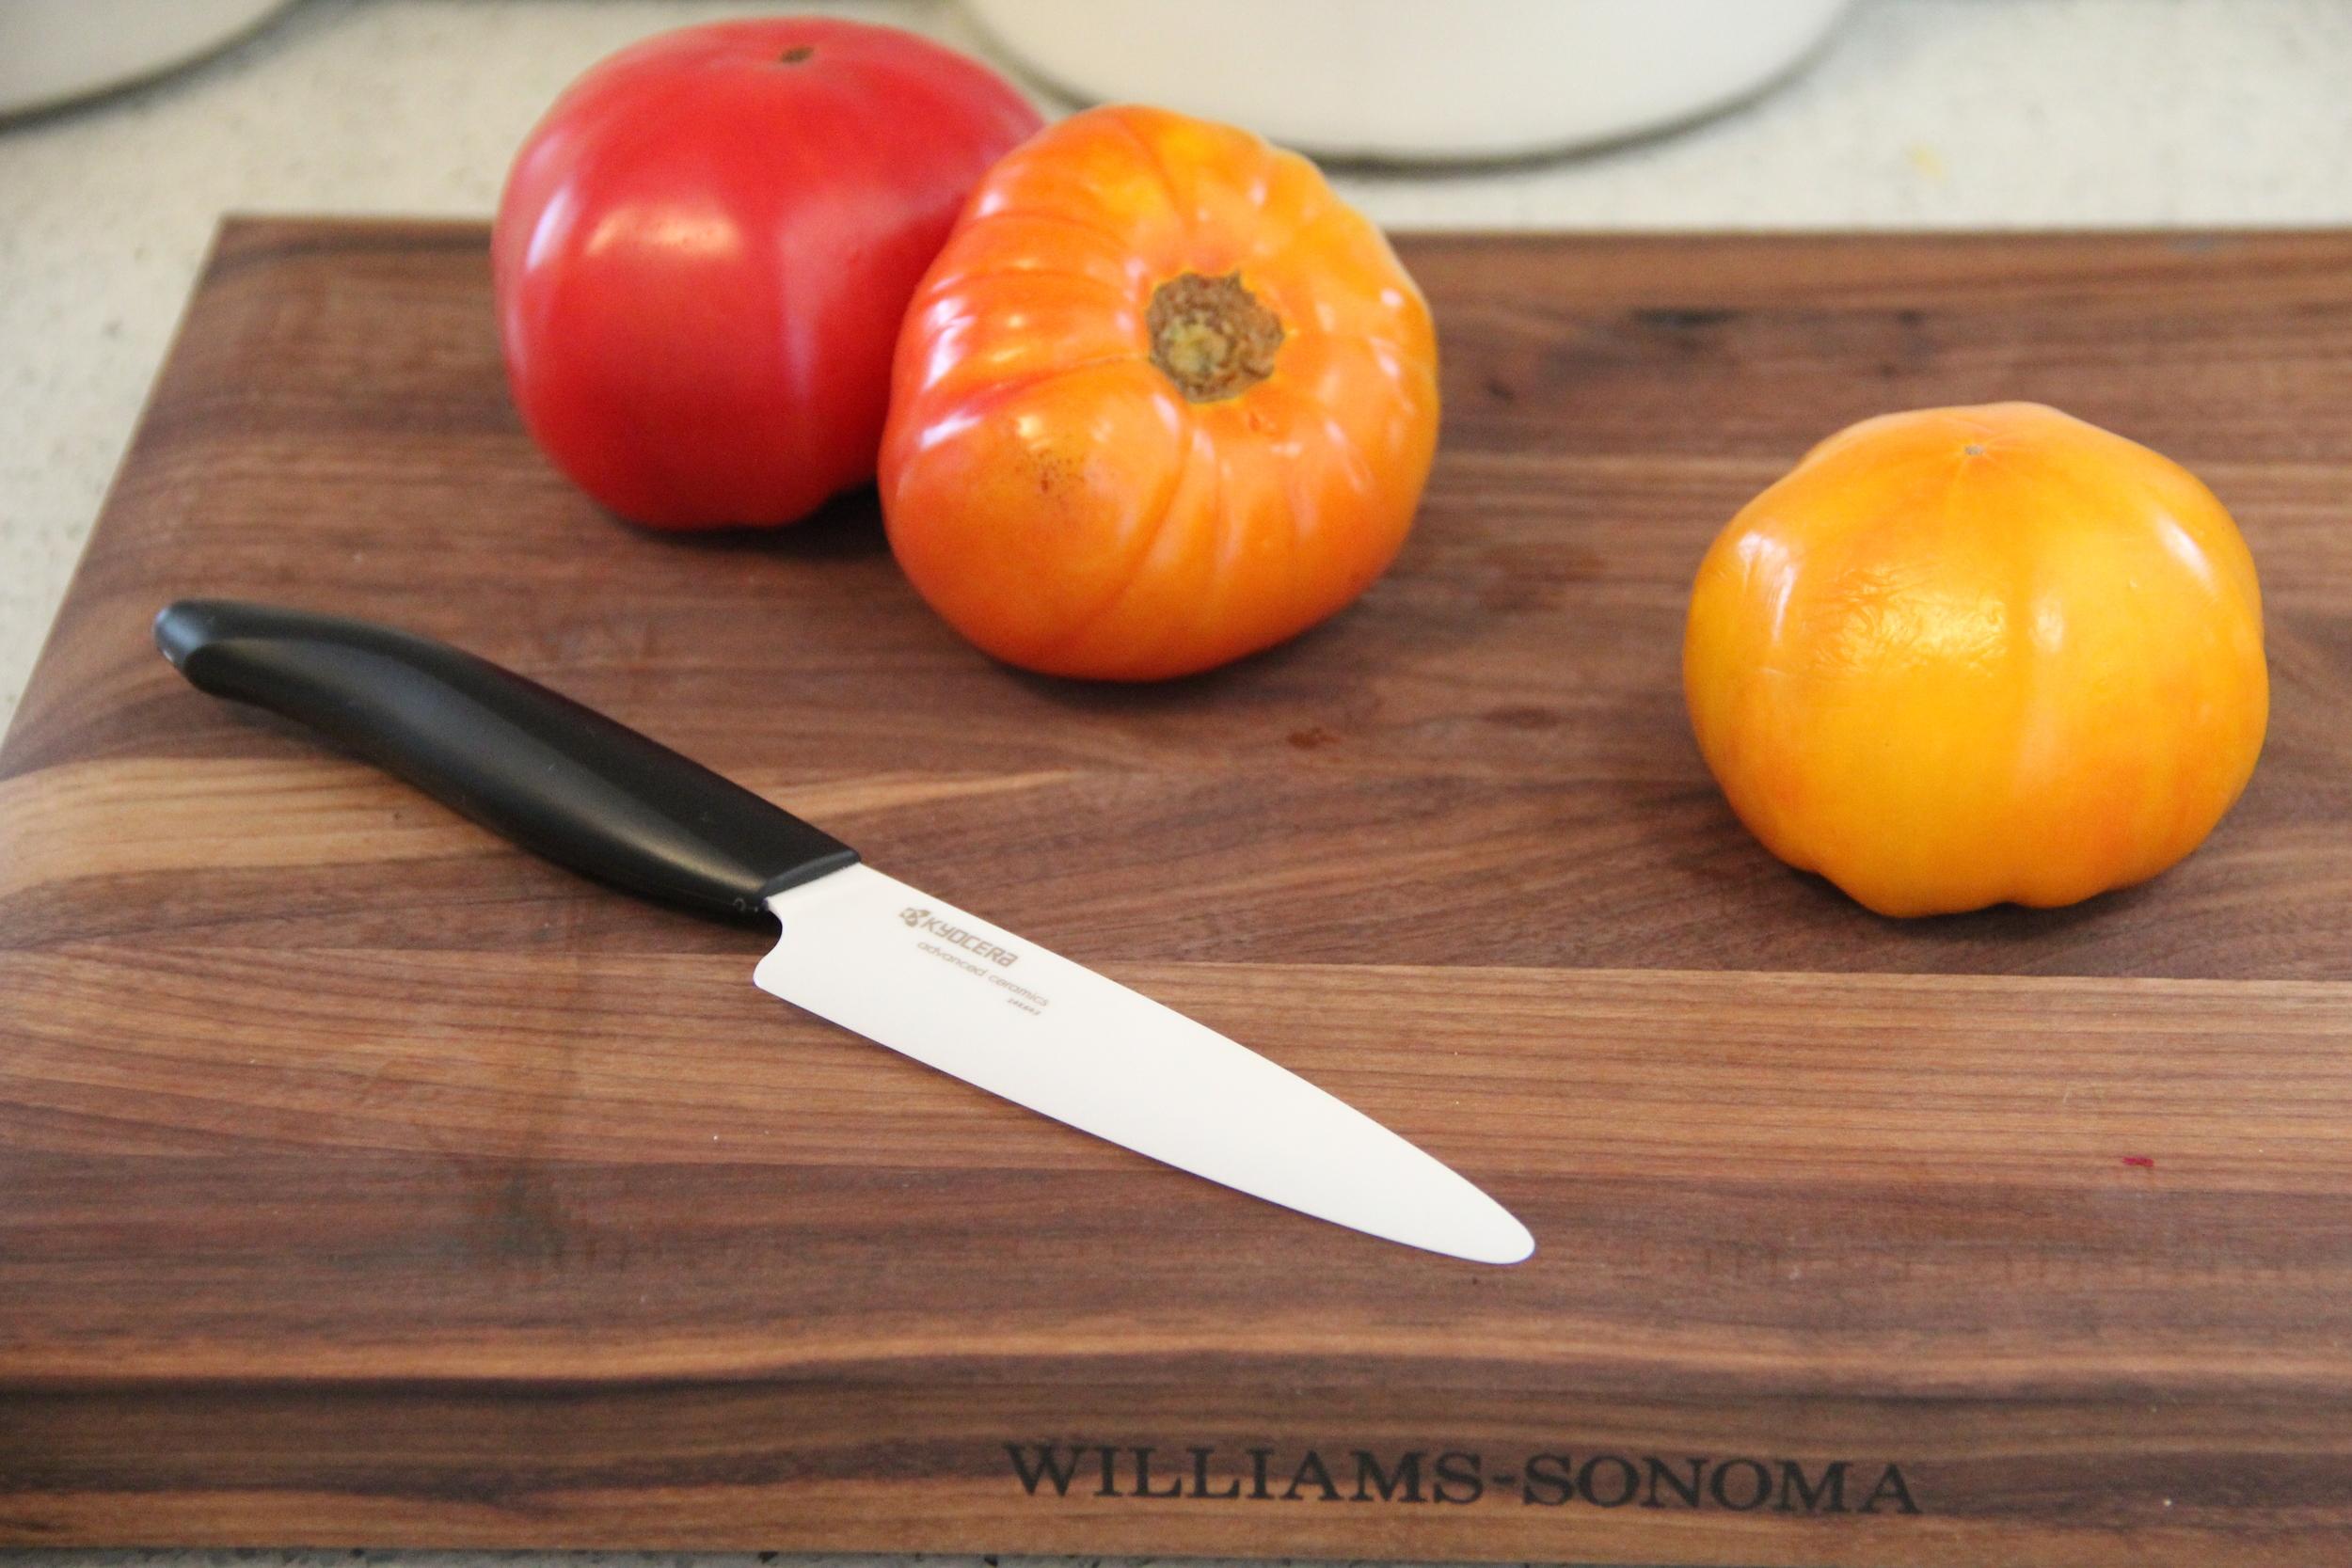 Kyocera Knife.JPG